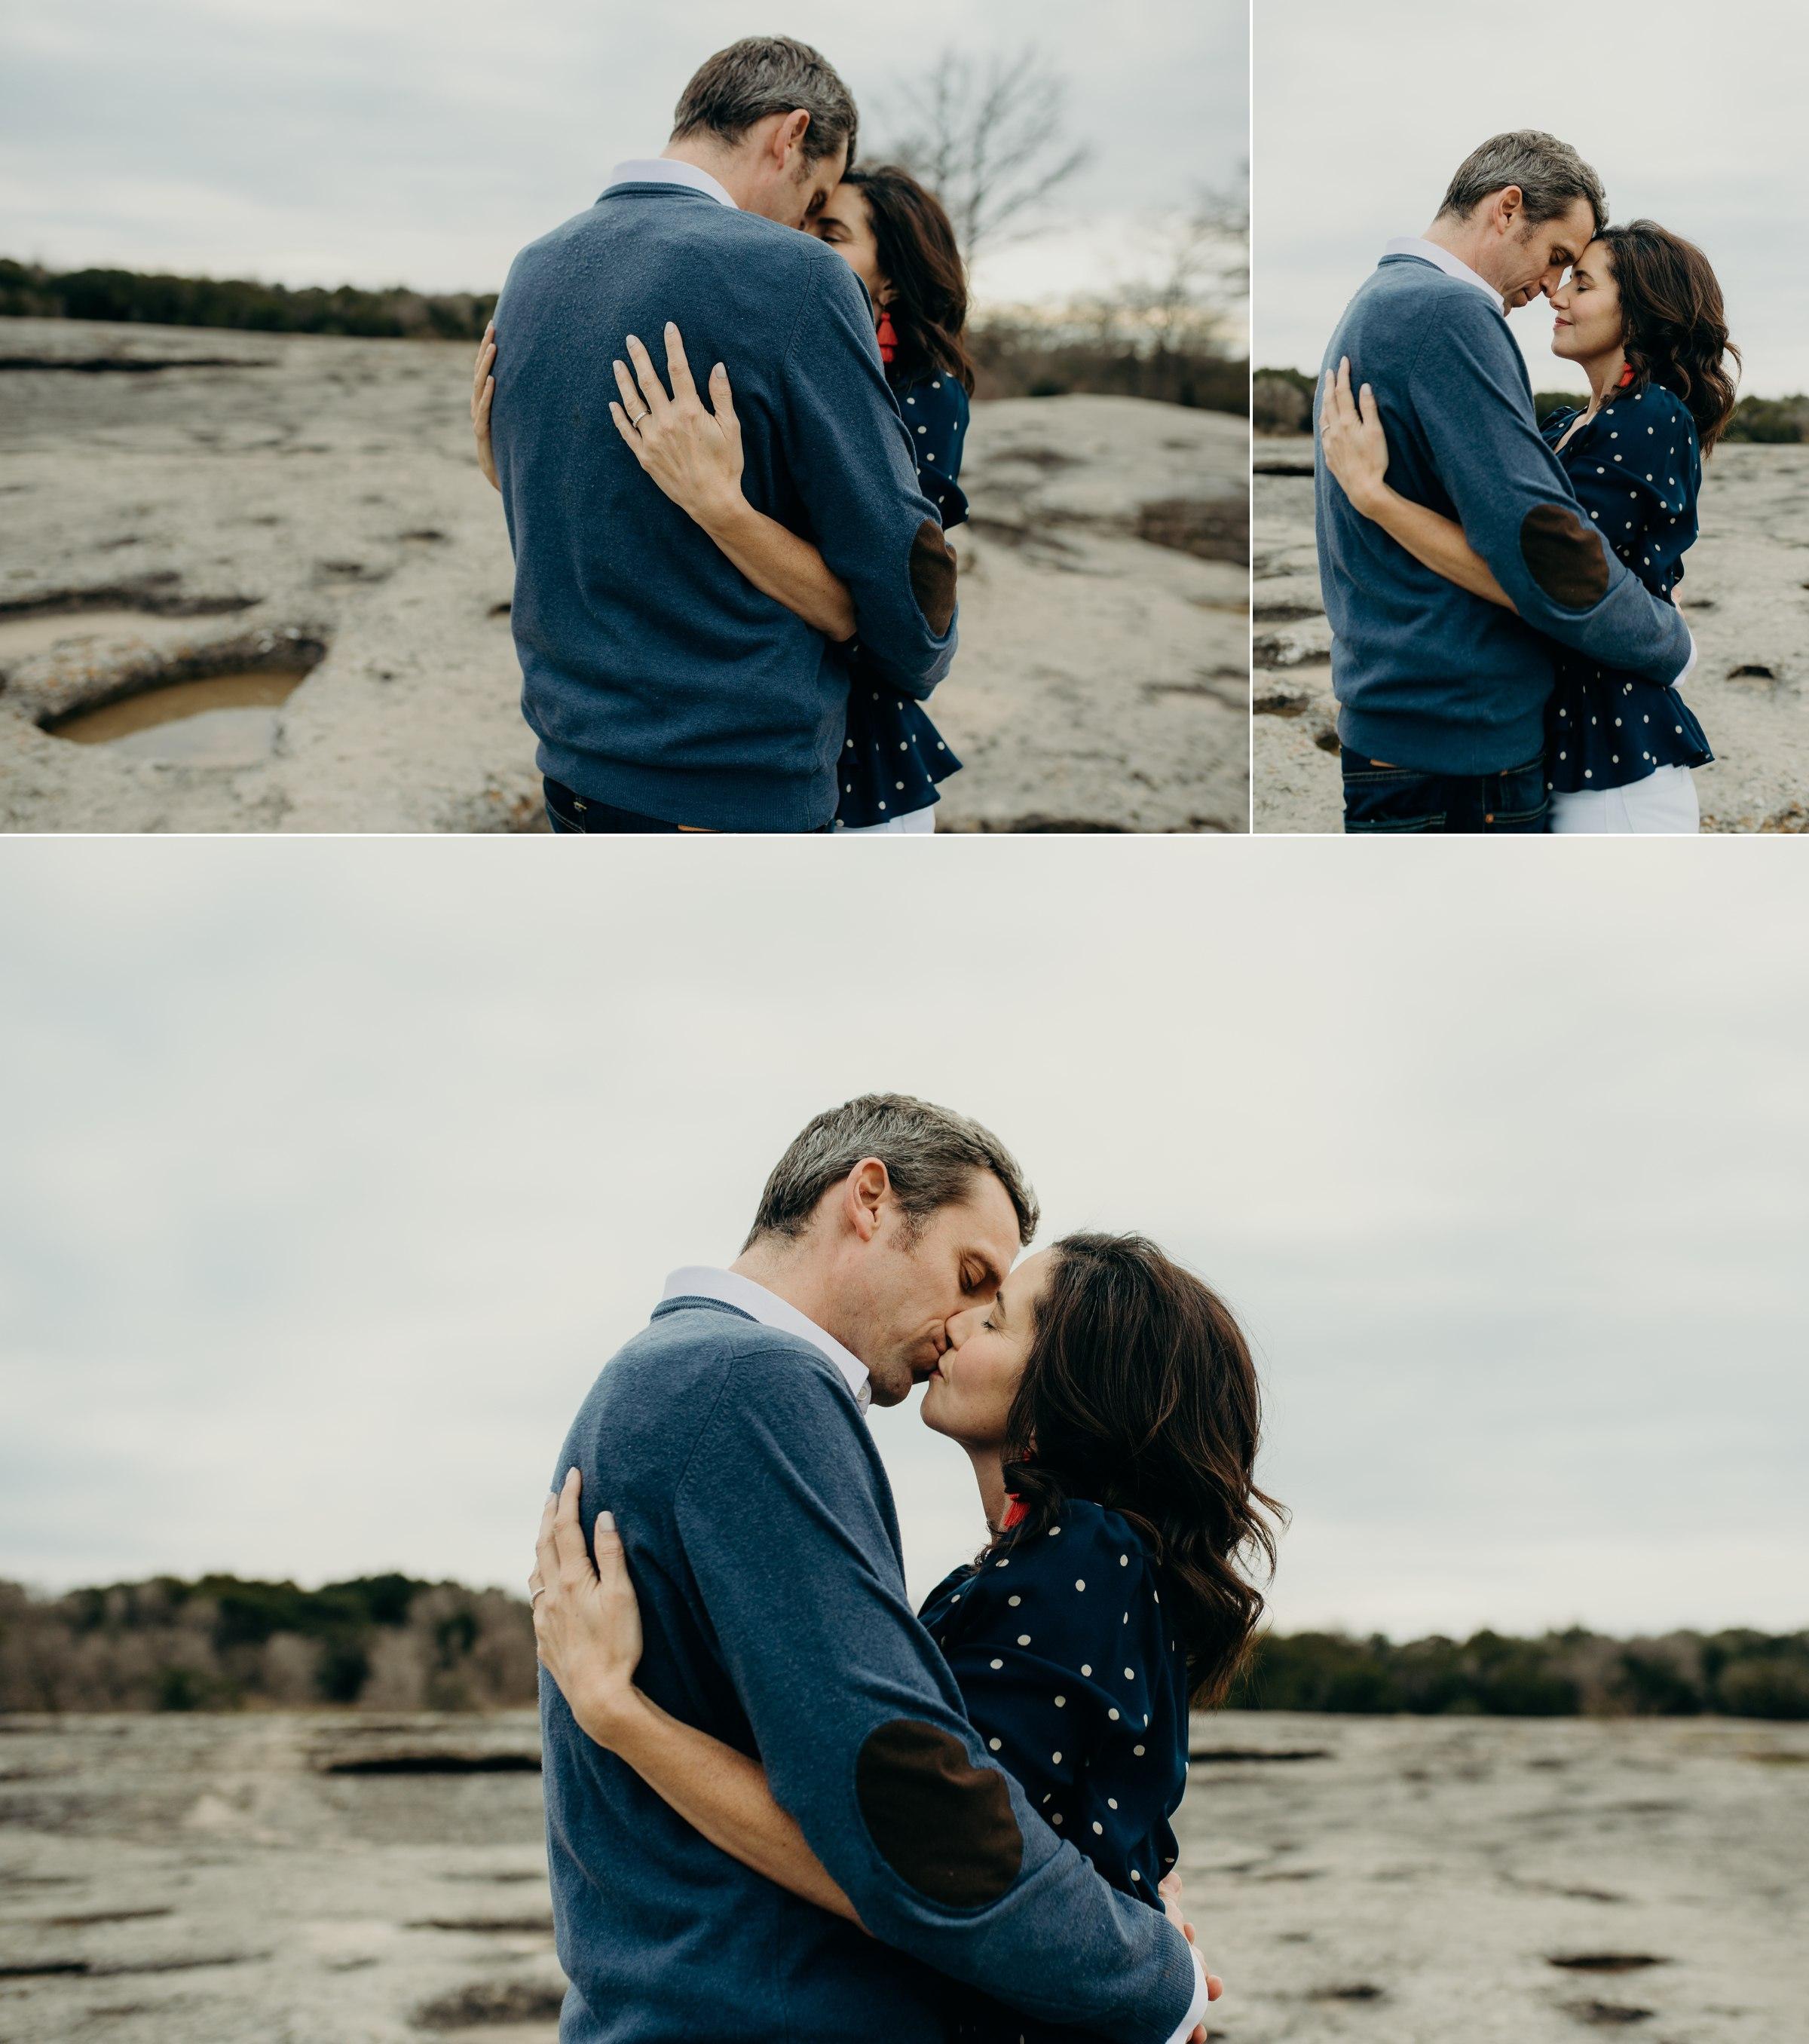 austin-mckinney-falls-engagement-photographer-elopement-prices-best-headshot-senior-adventurous-italy-minneapolis-texas-minnesota-dallas-houston-tulum-mexico_0011.jpg